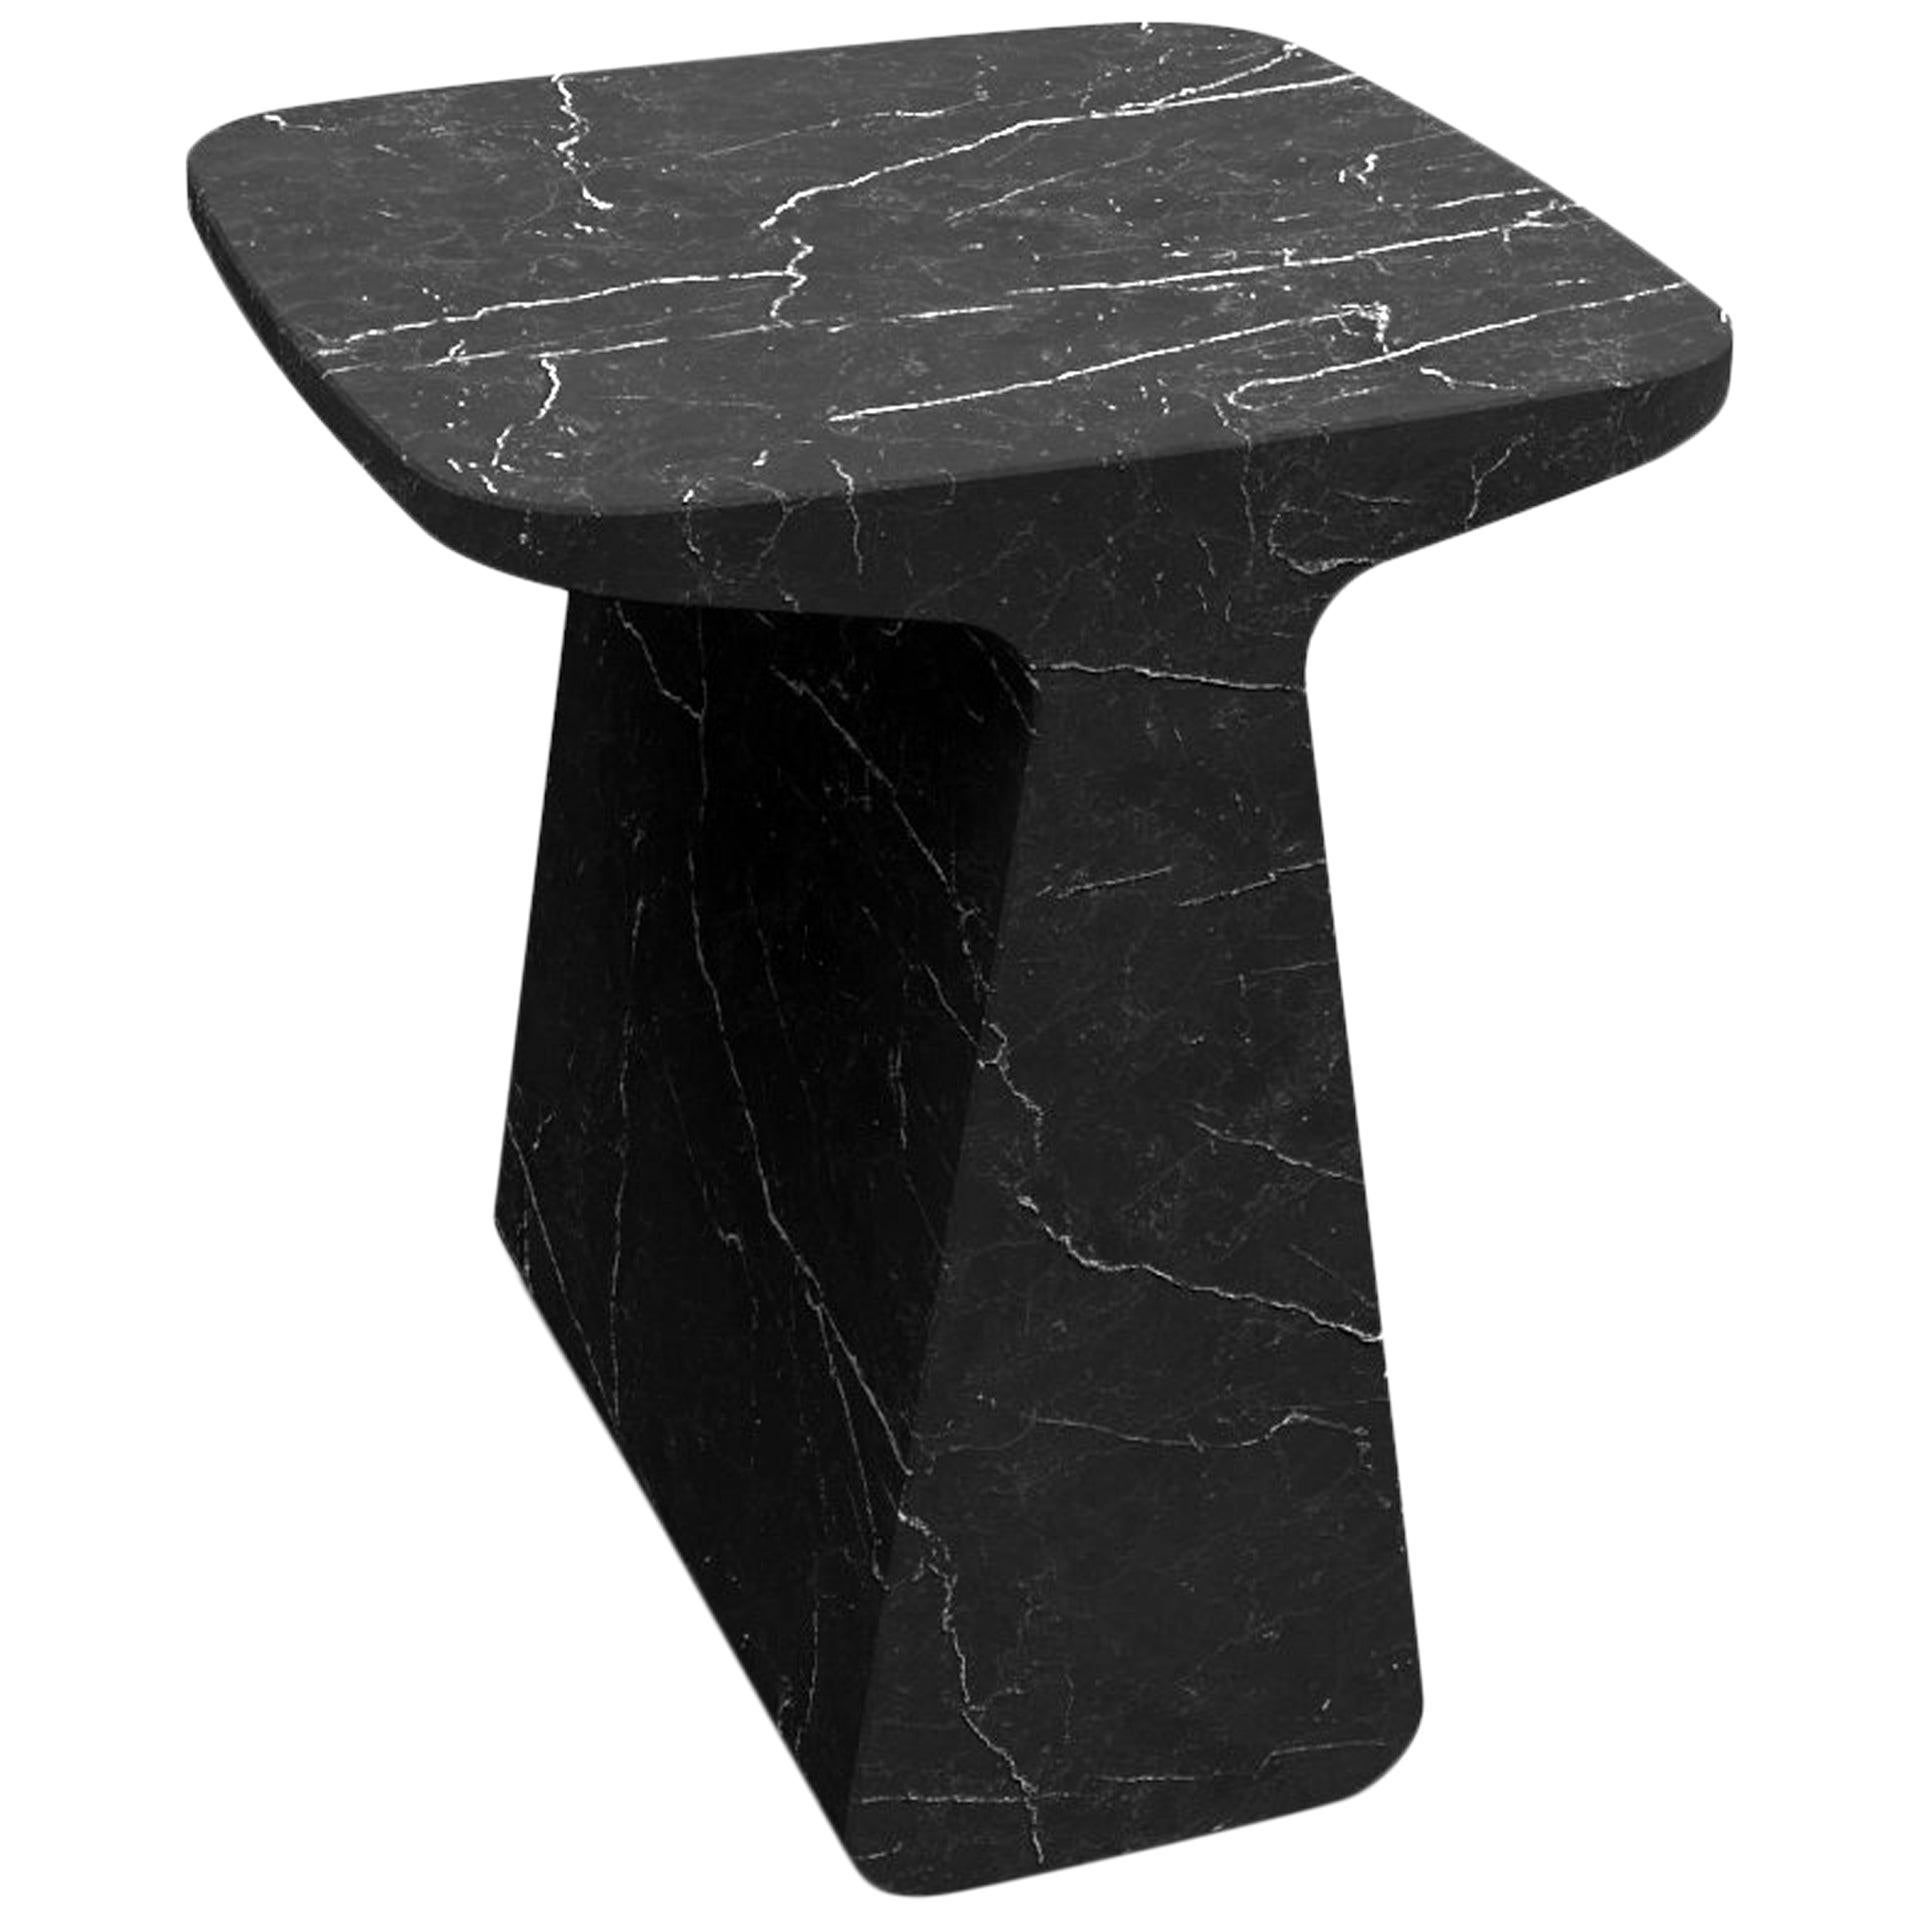 Adolfo Abejon Contemporary 'Pura' Black Marquina Marble Sculptural Coffee Table